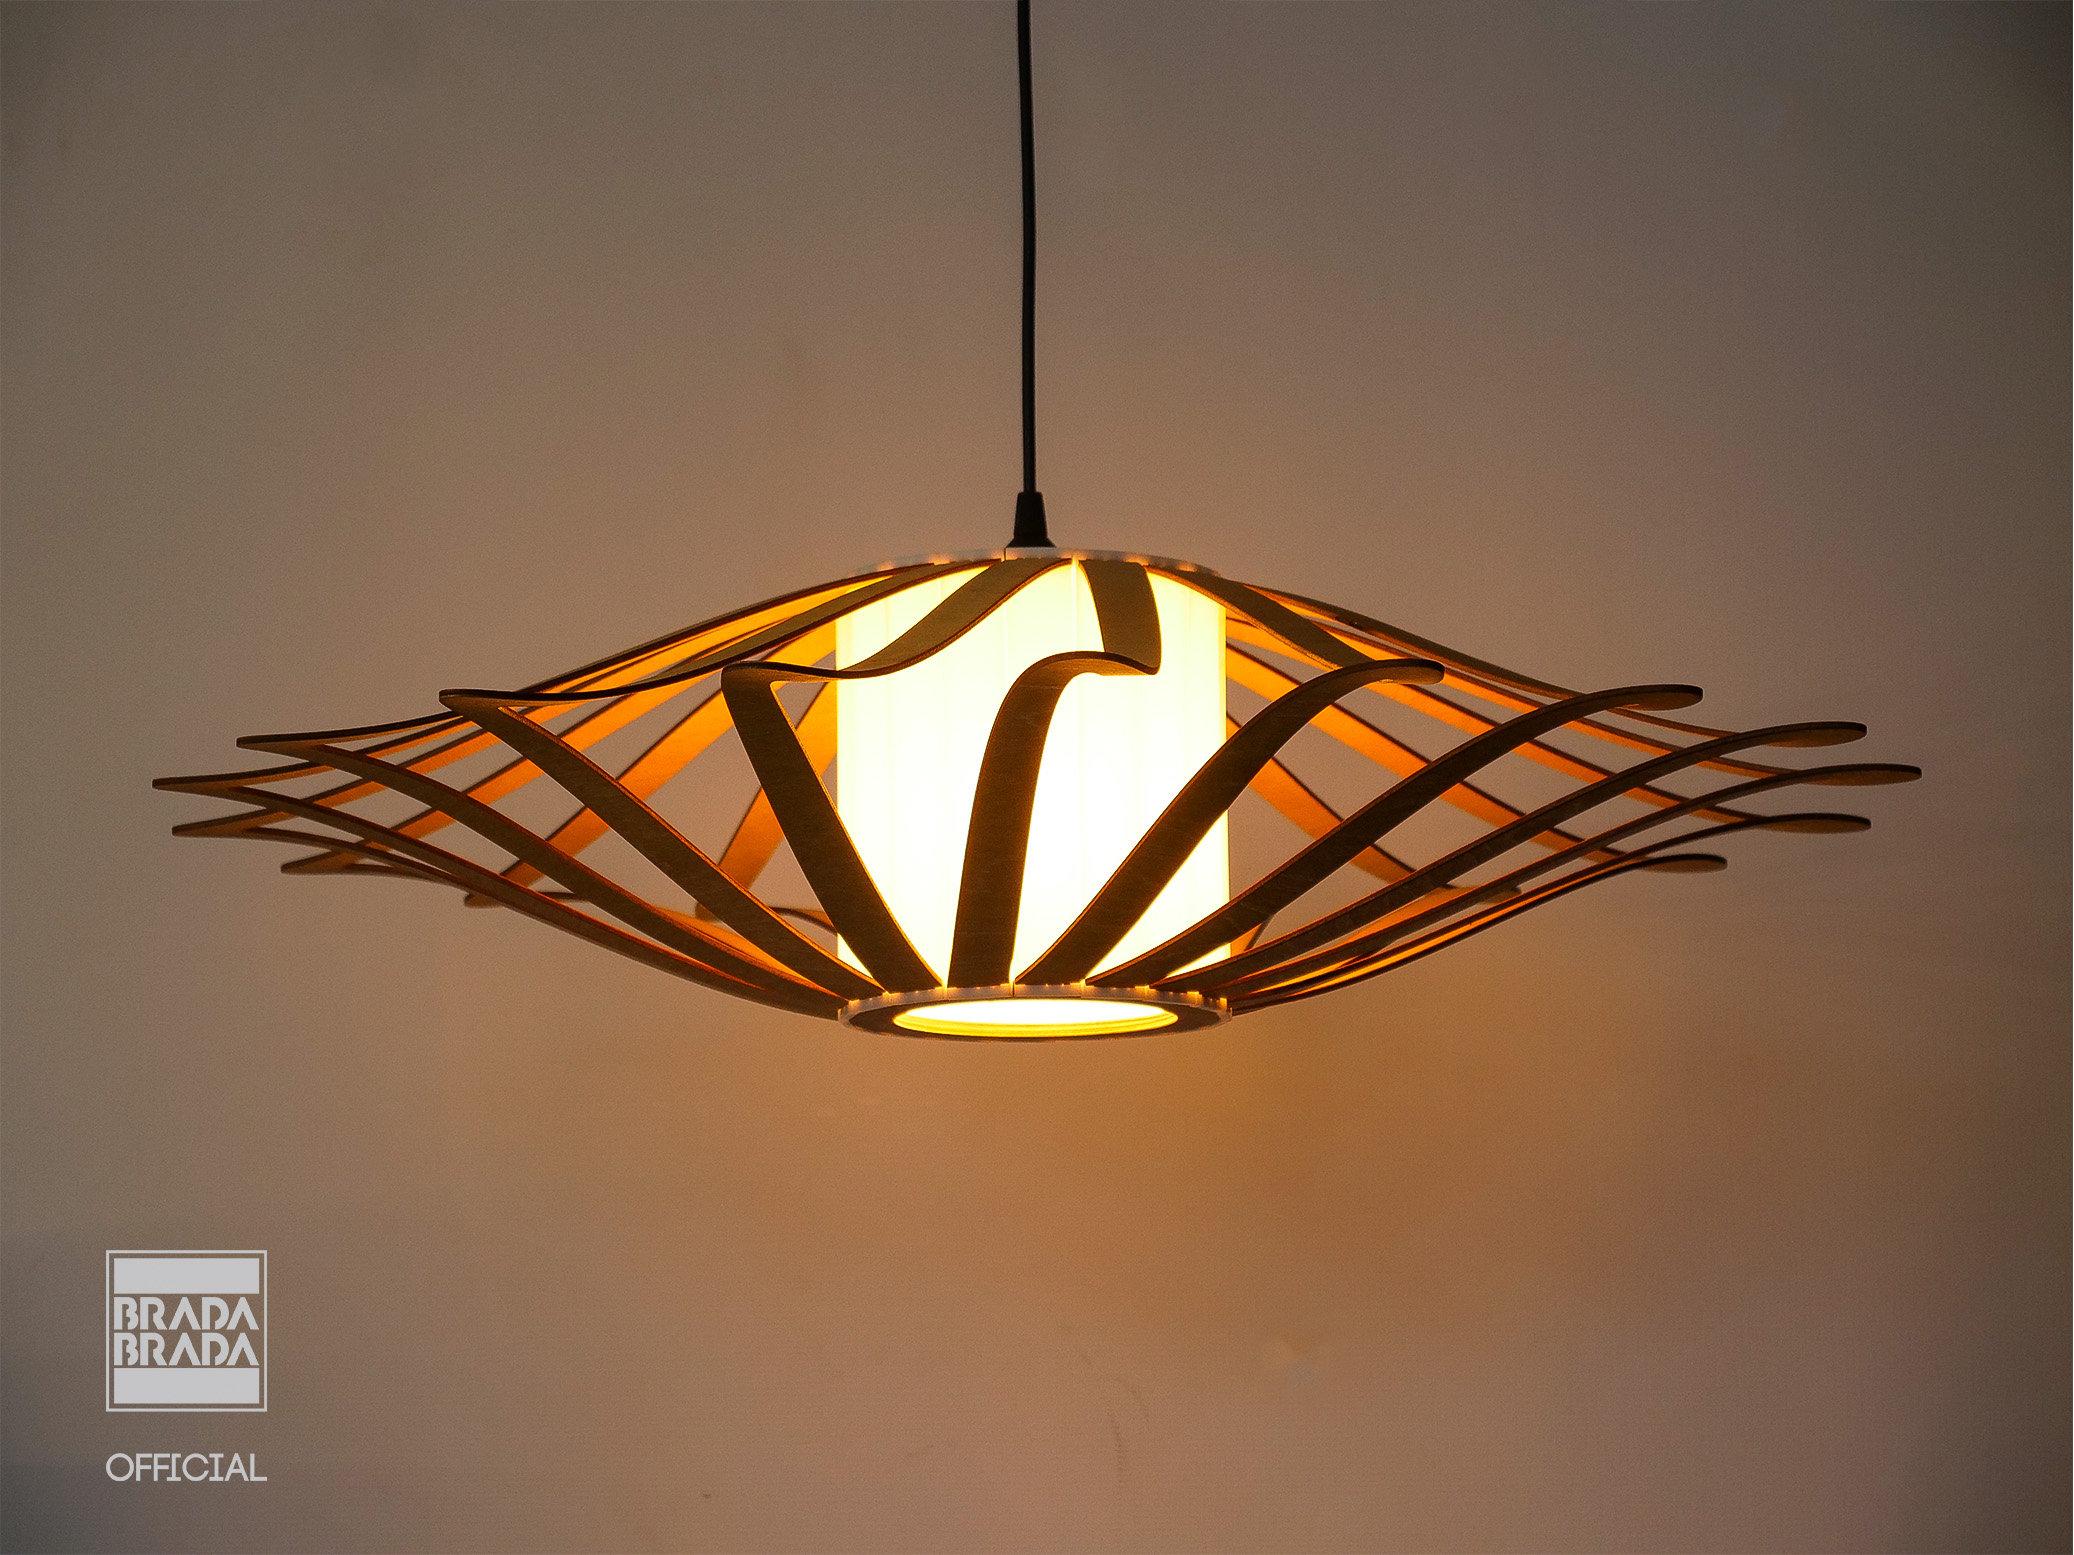 Ufo Wooden Lamp Shade Hanging Lamp Ceiling Light Wood Lamp Wooden Fixture Pend Brada Brada